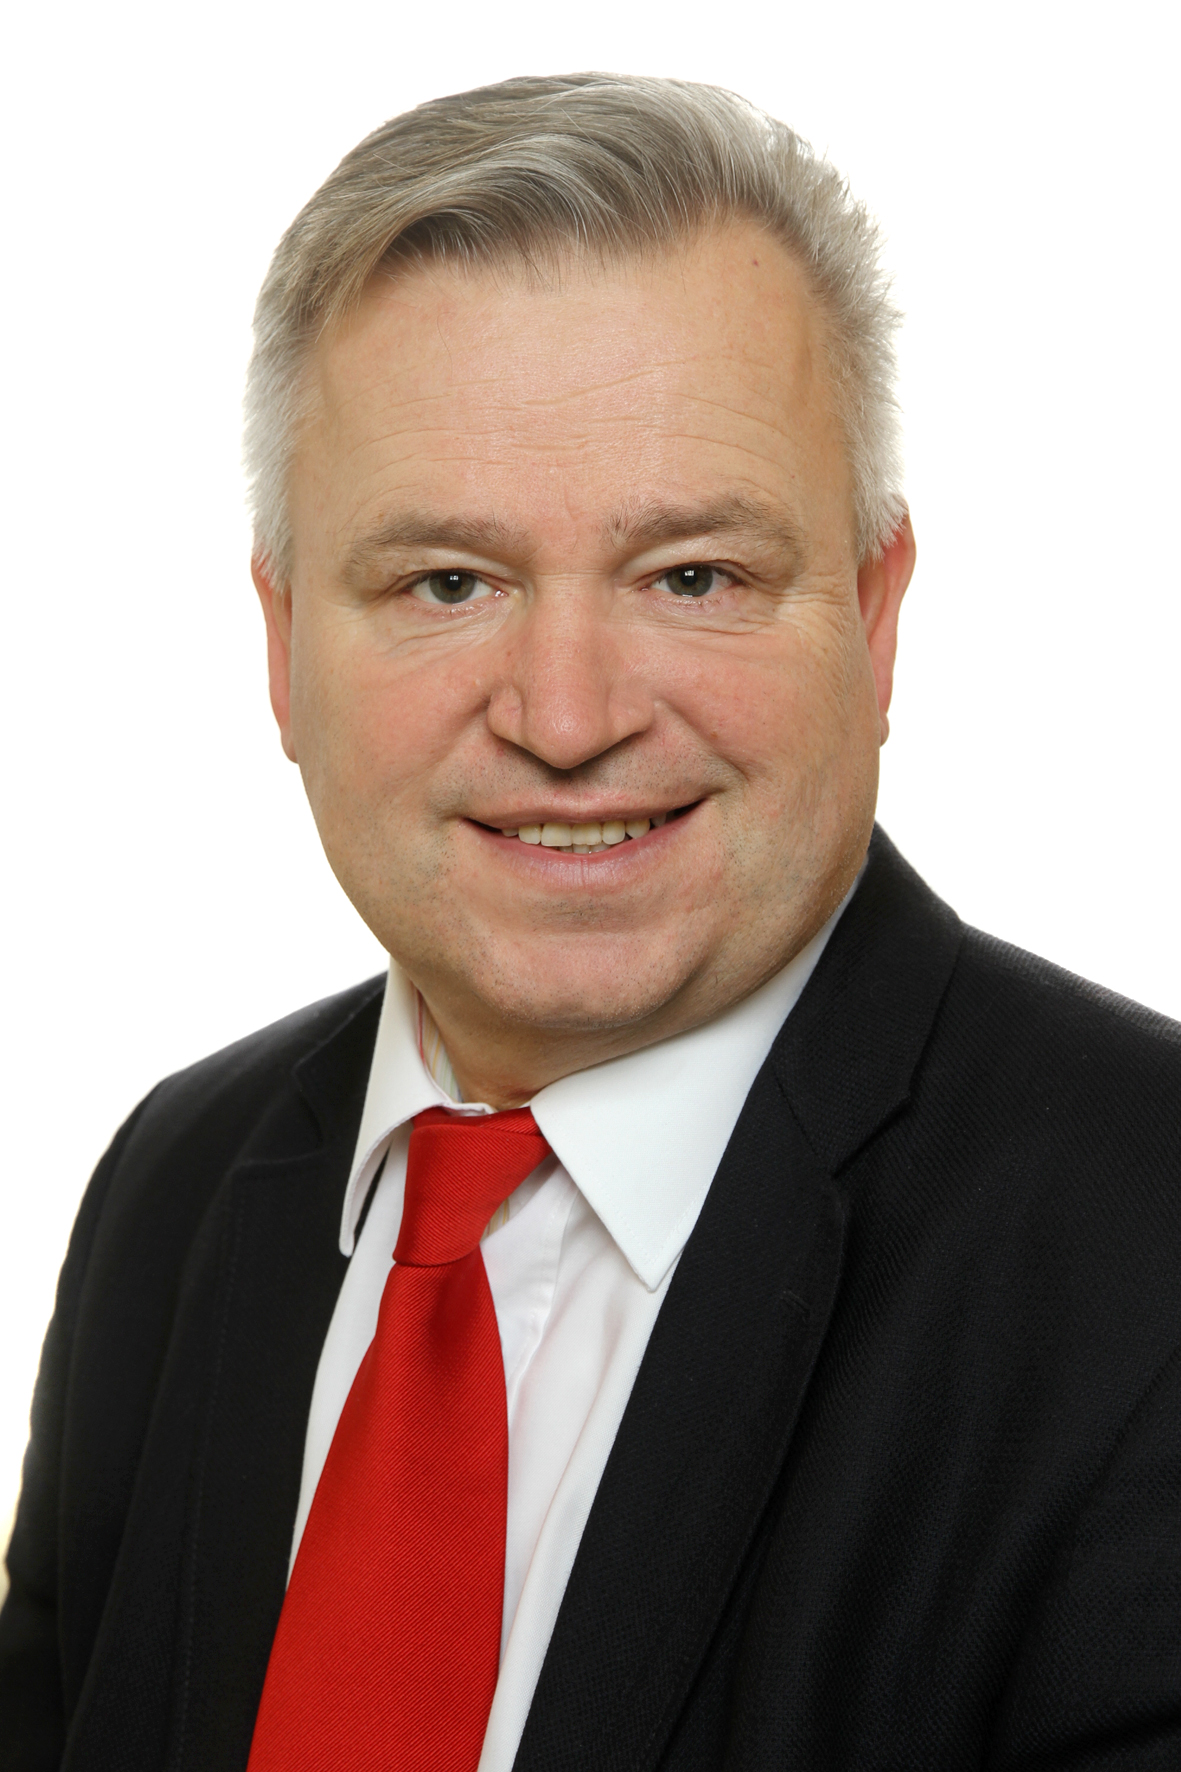 Waldemar Donath